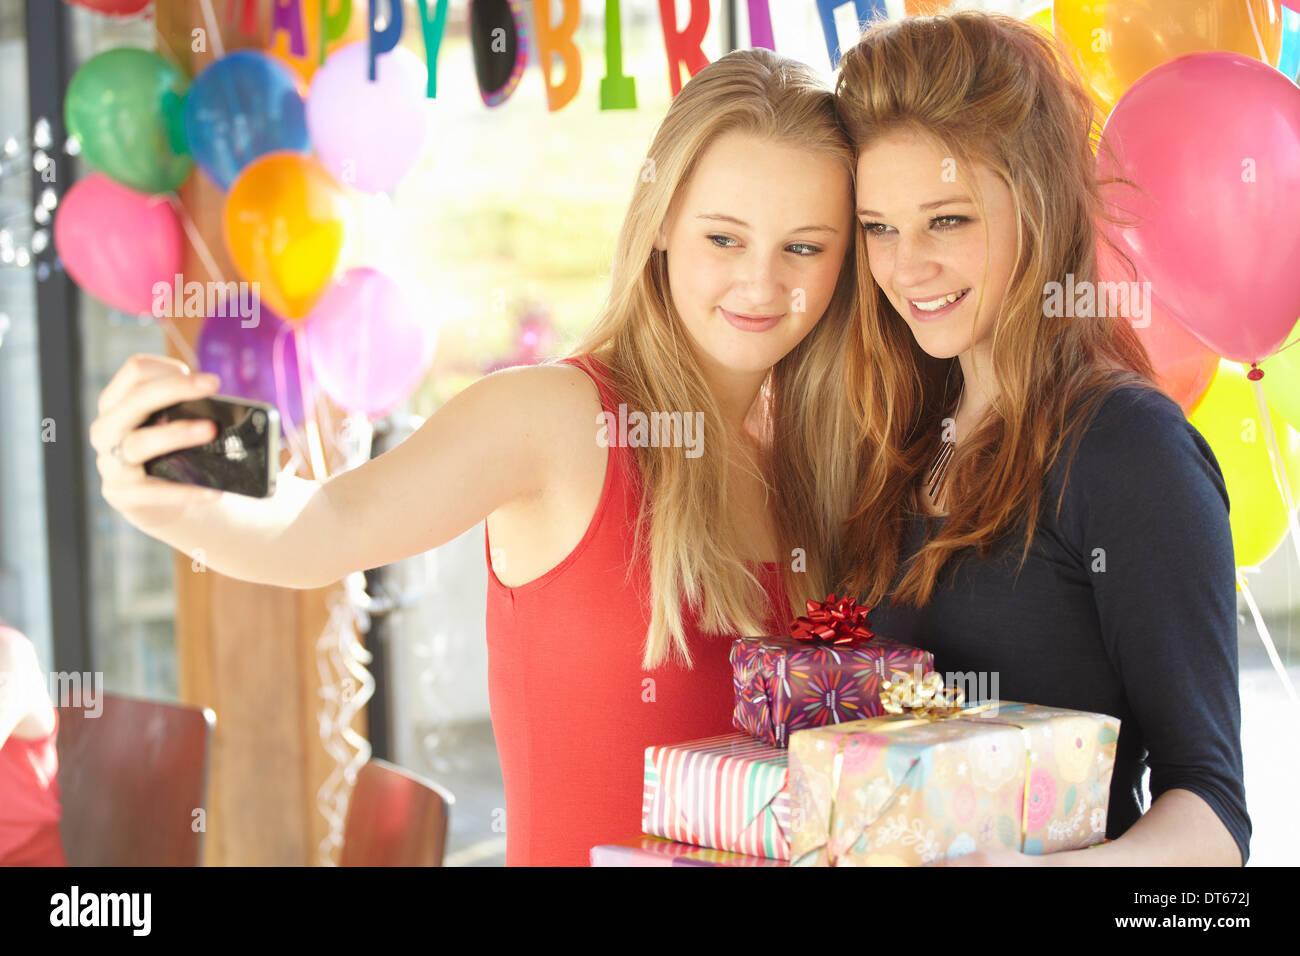 Two teenage girls taking selfie at birthday party - Stock Image